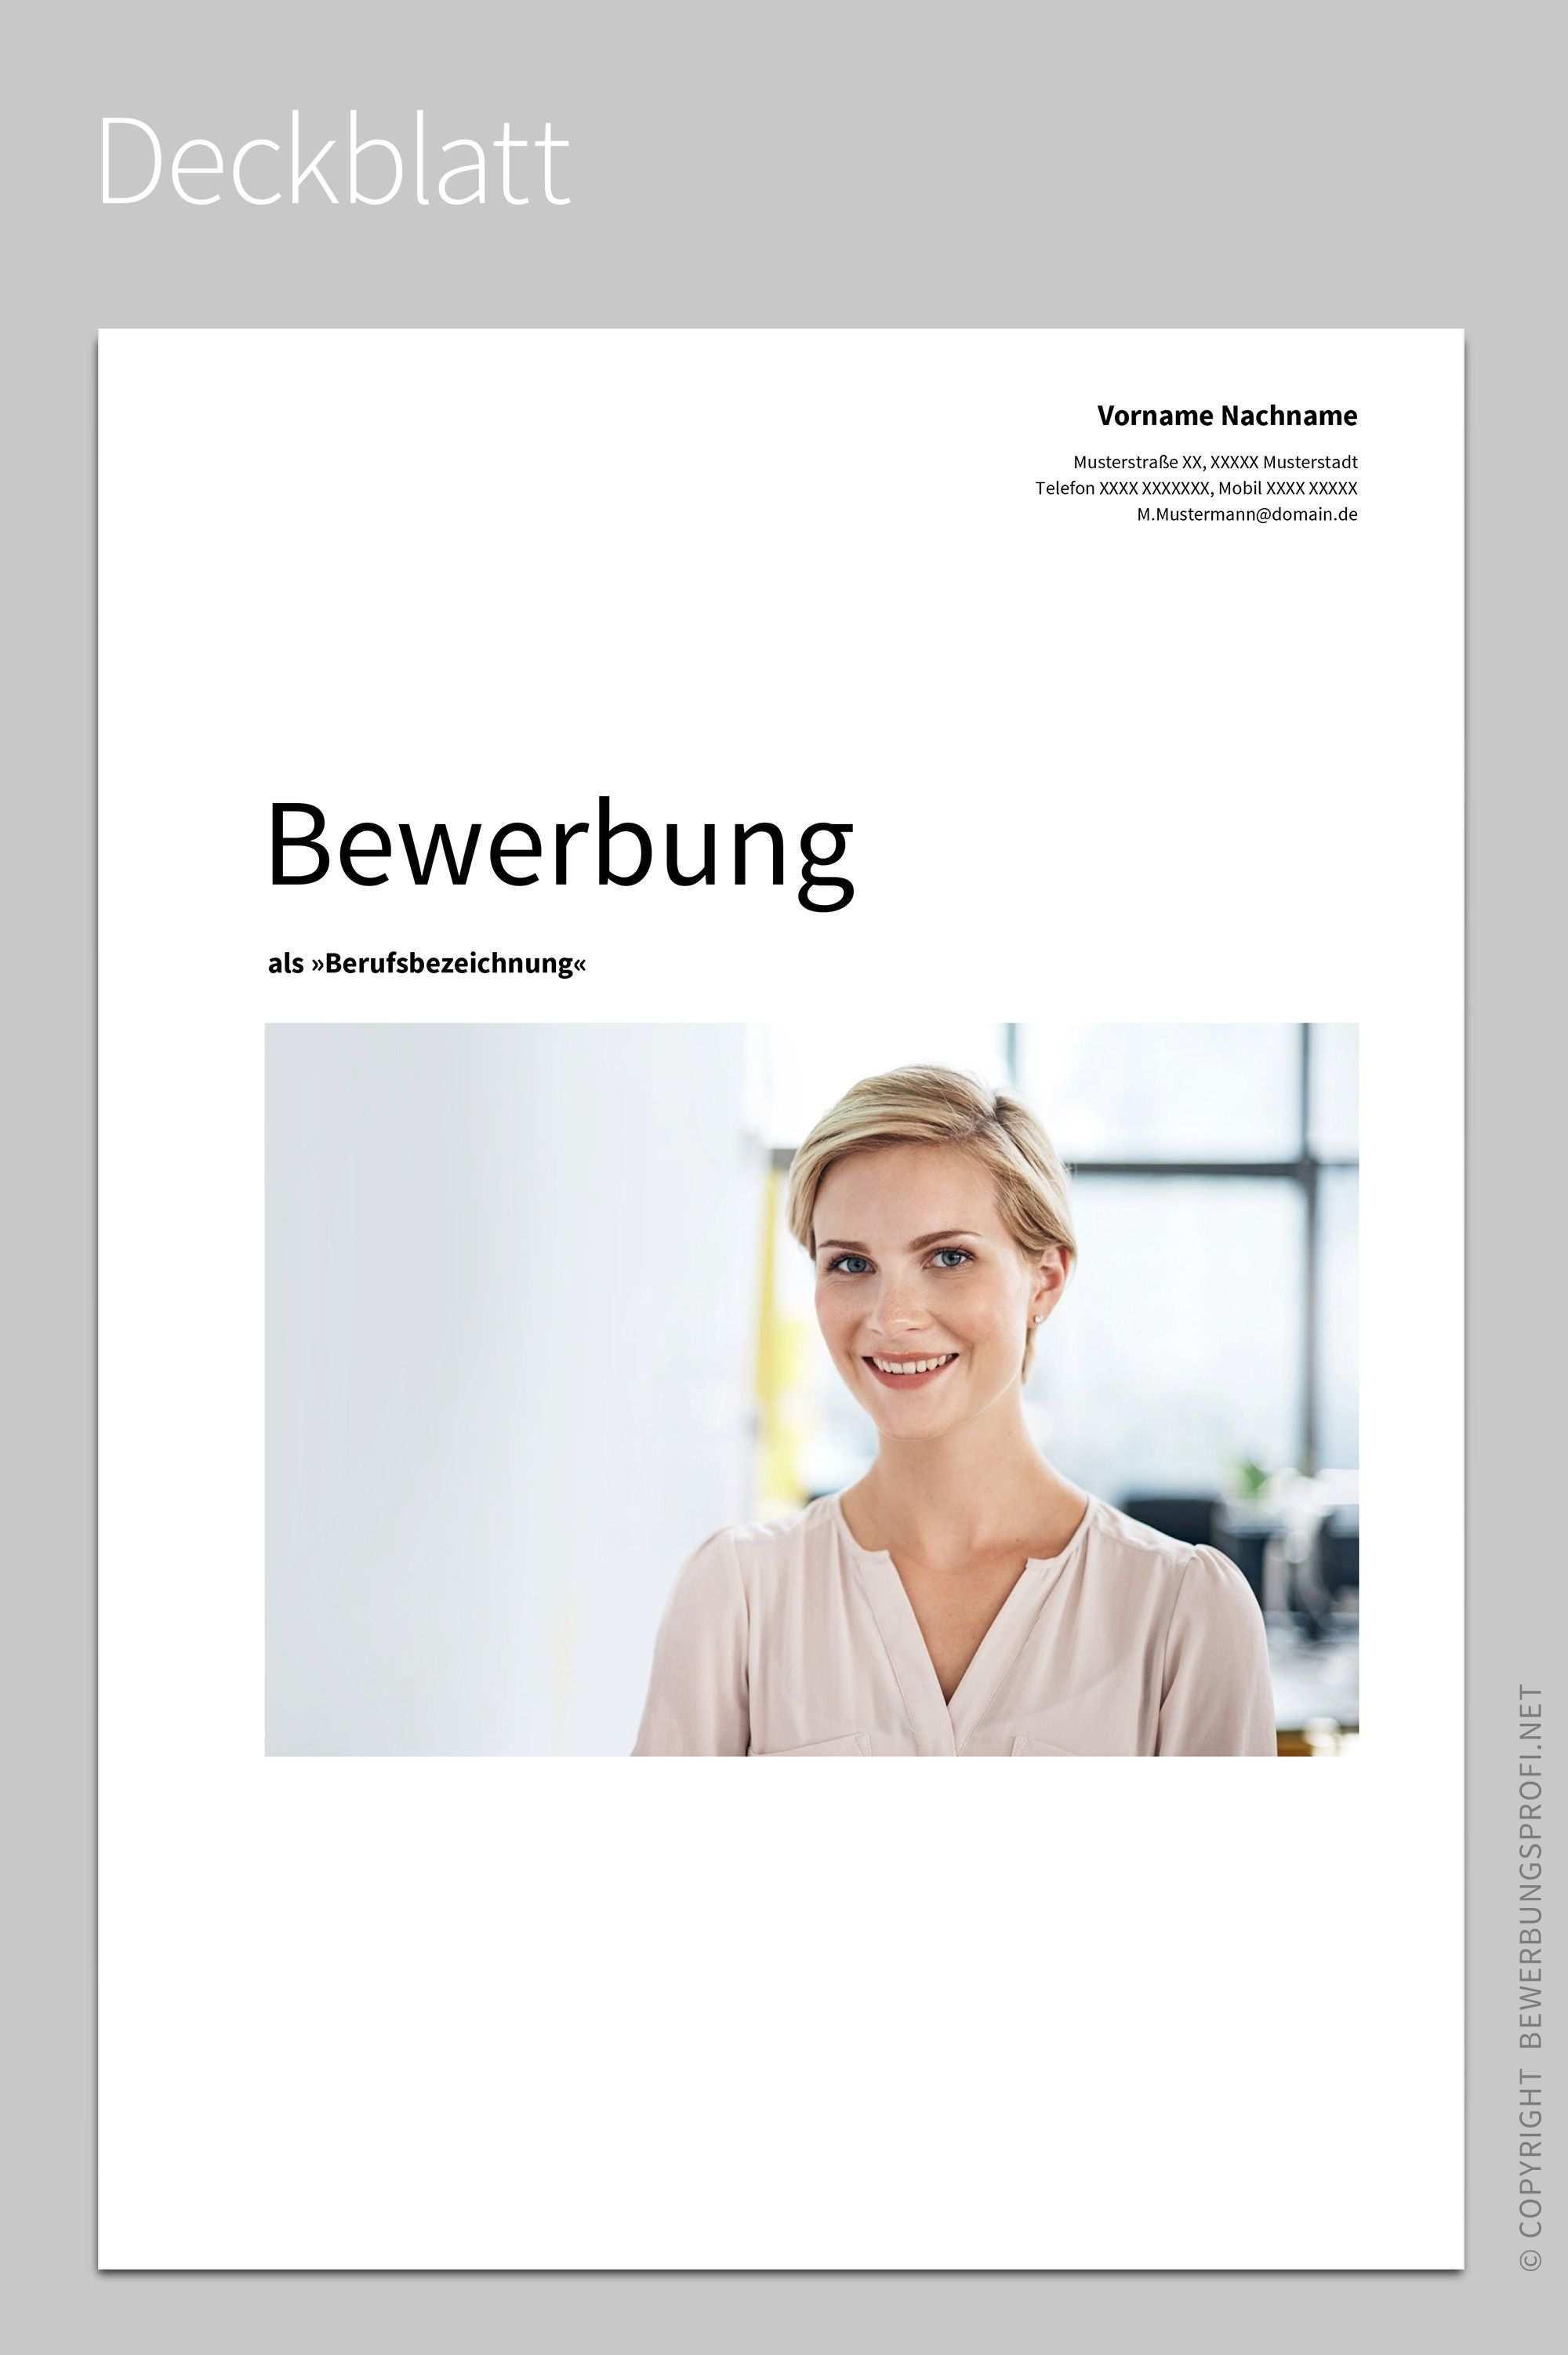 Deckblatt Albus Deckblatt Bewerbung Online Bewerbung Bewerbung Lebenslauf